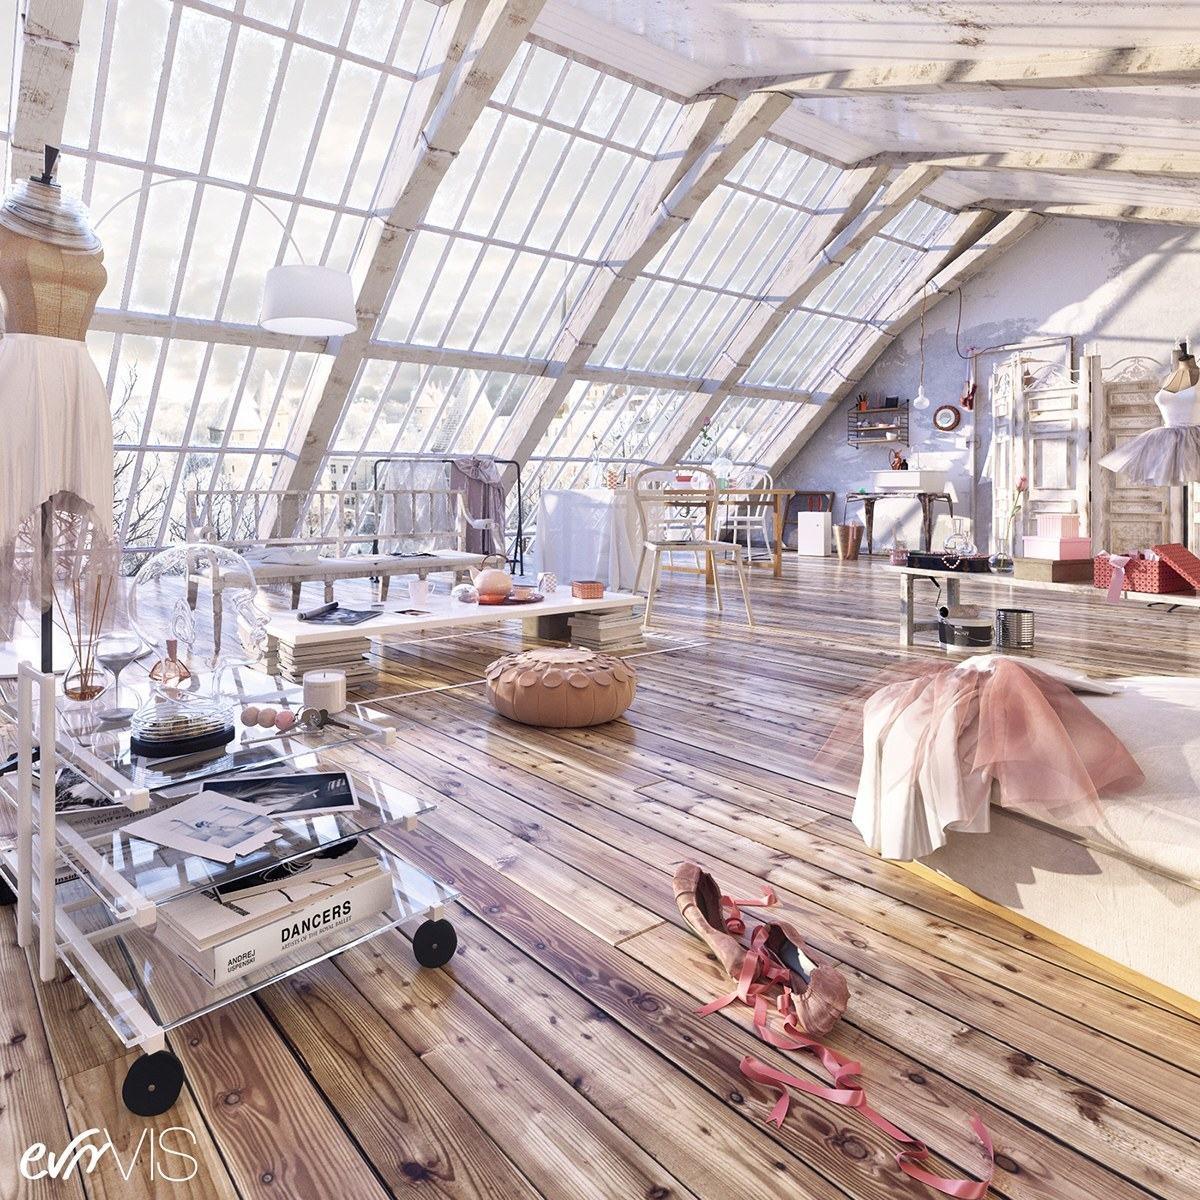 Loft apartmnet decorating ideas